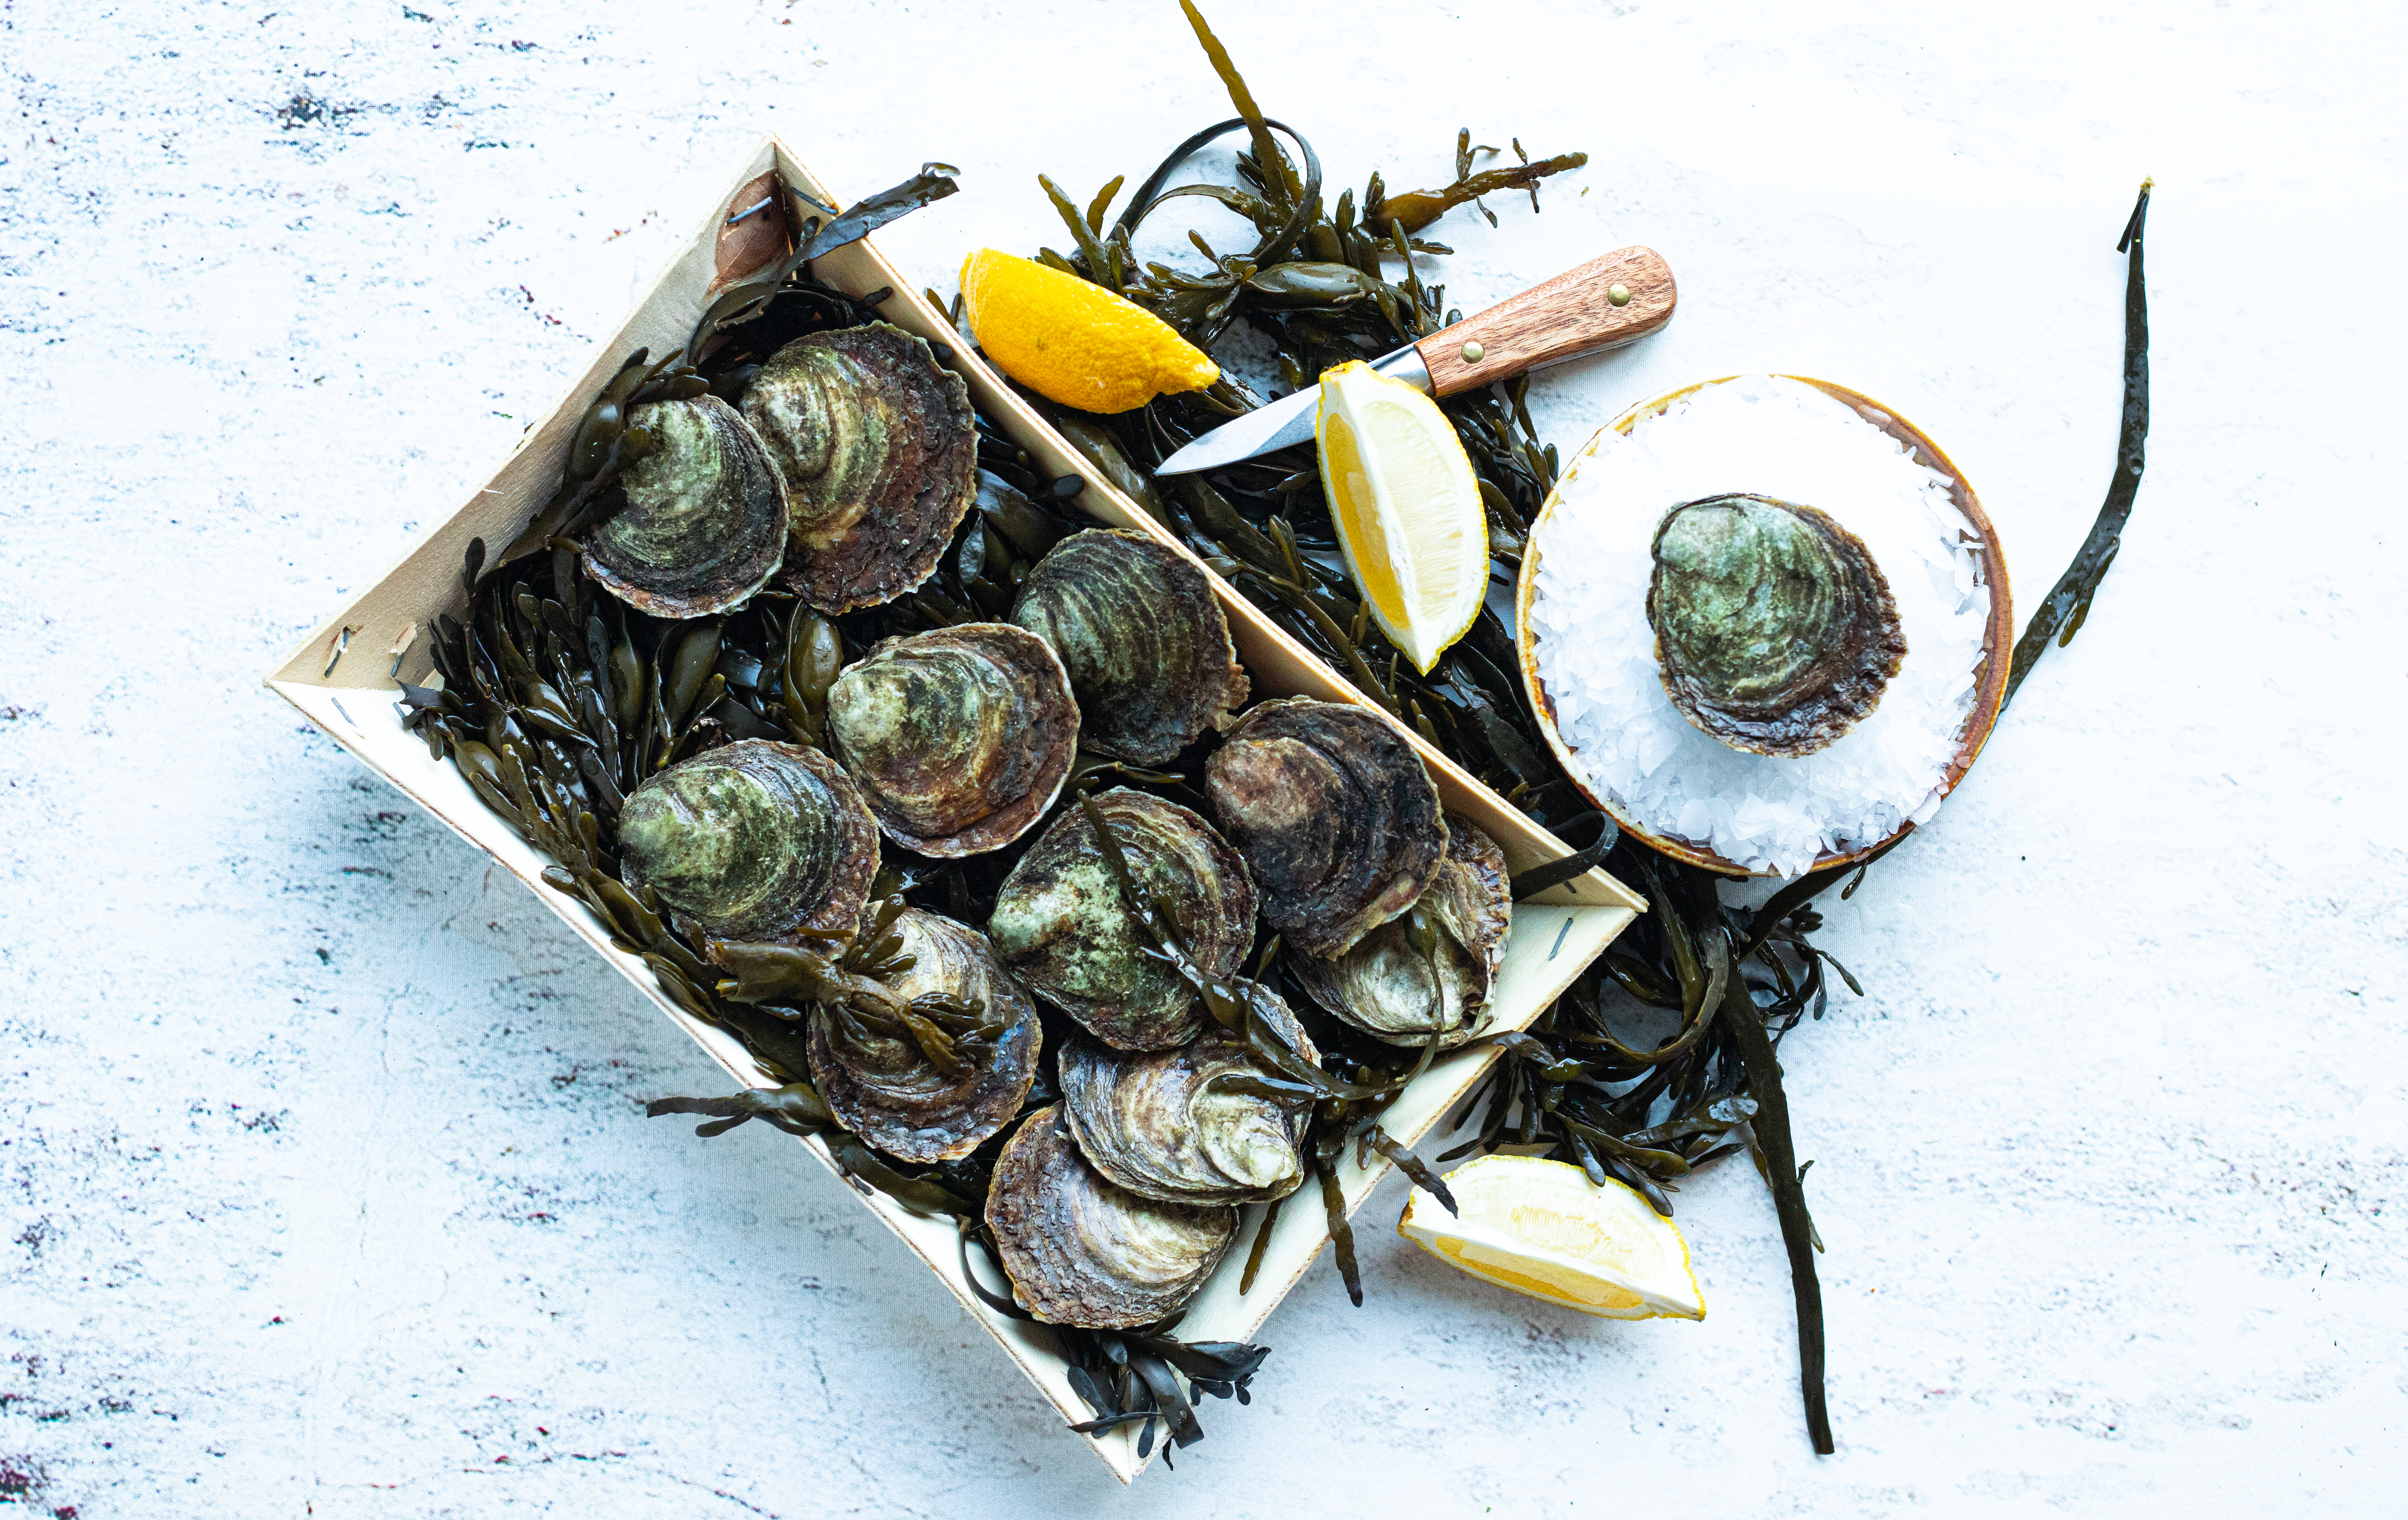 Zeeuwse platte oester 4° (12 stuks)